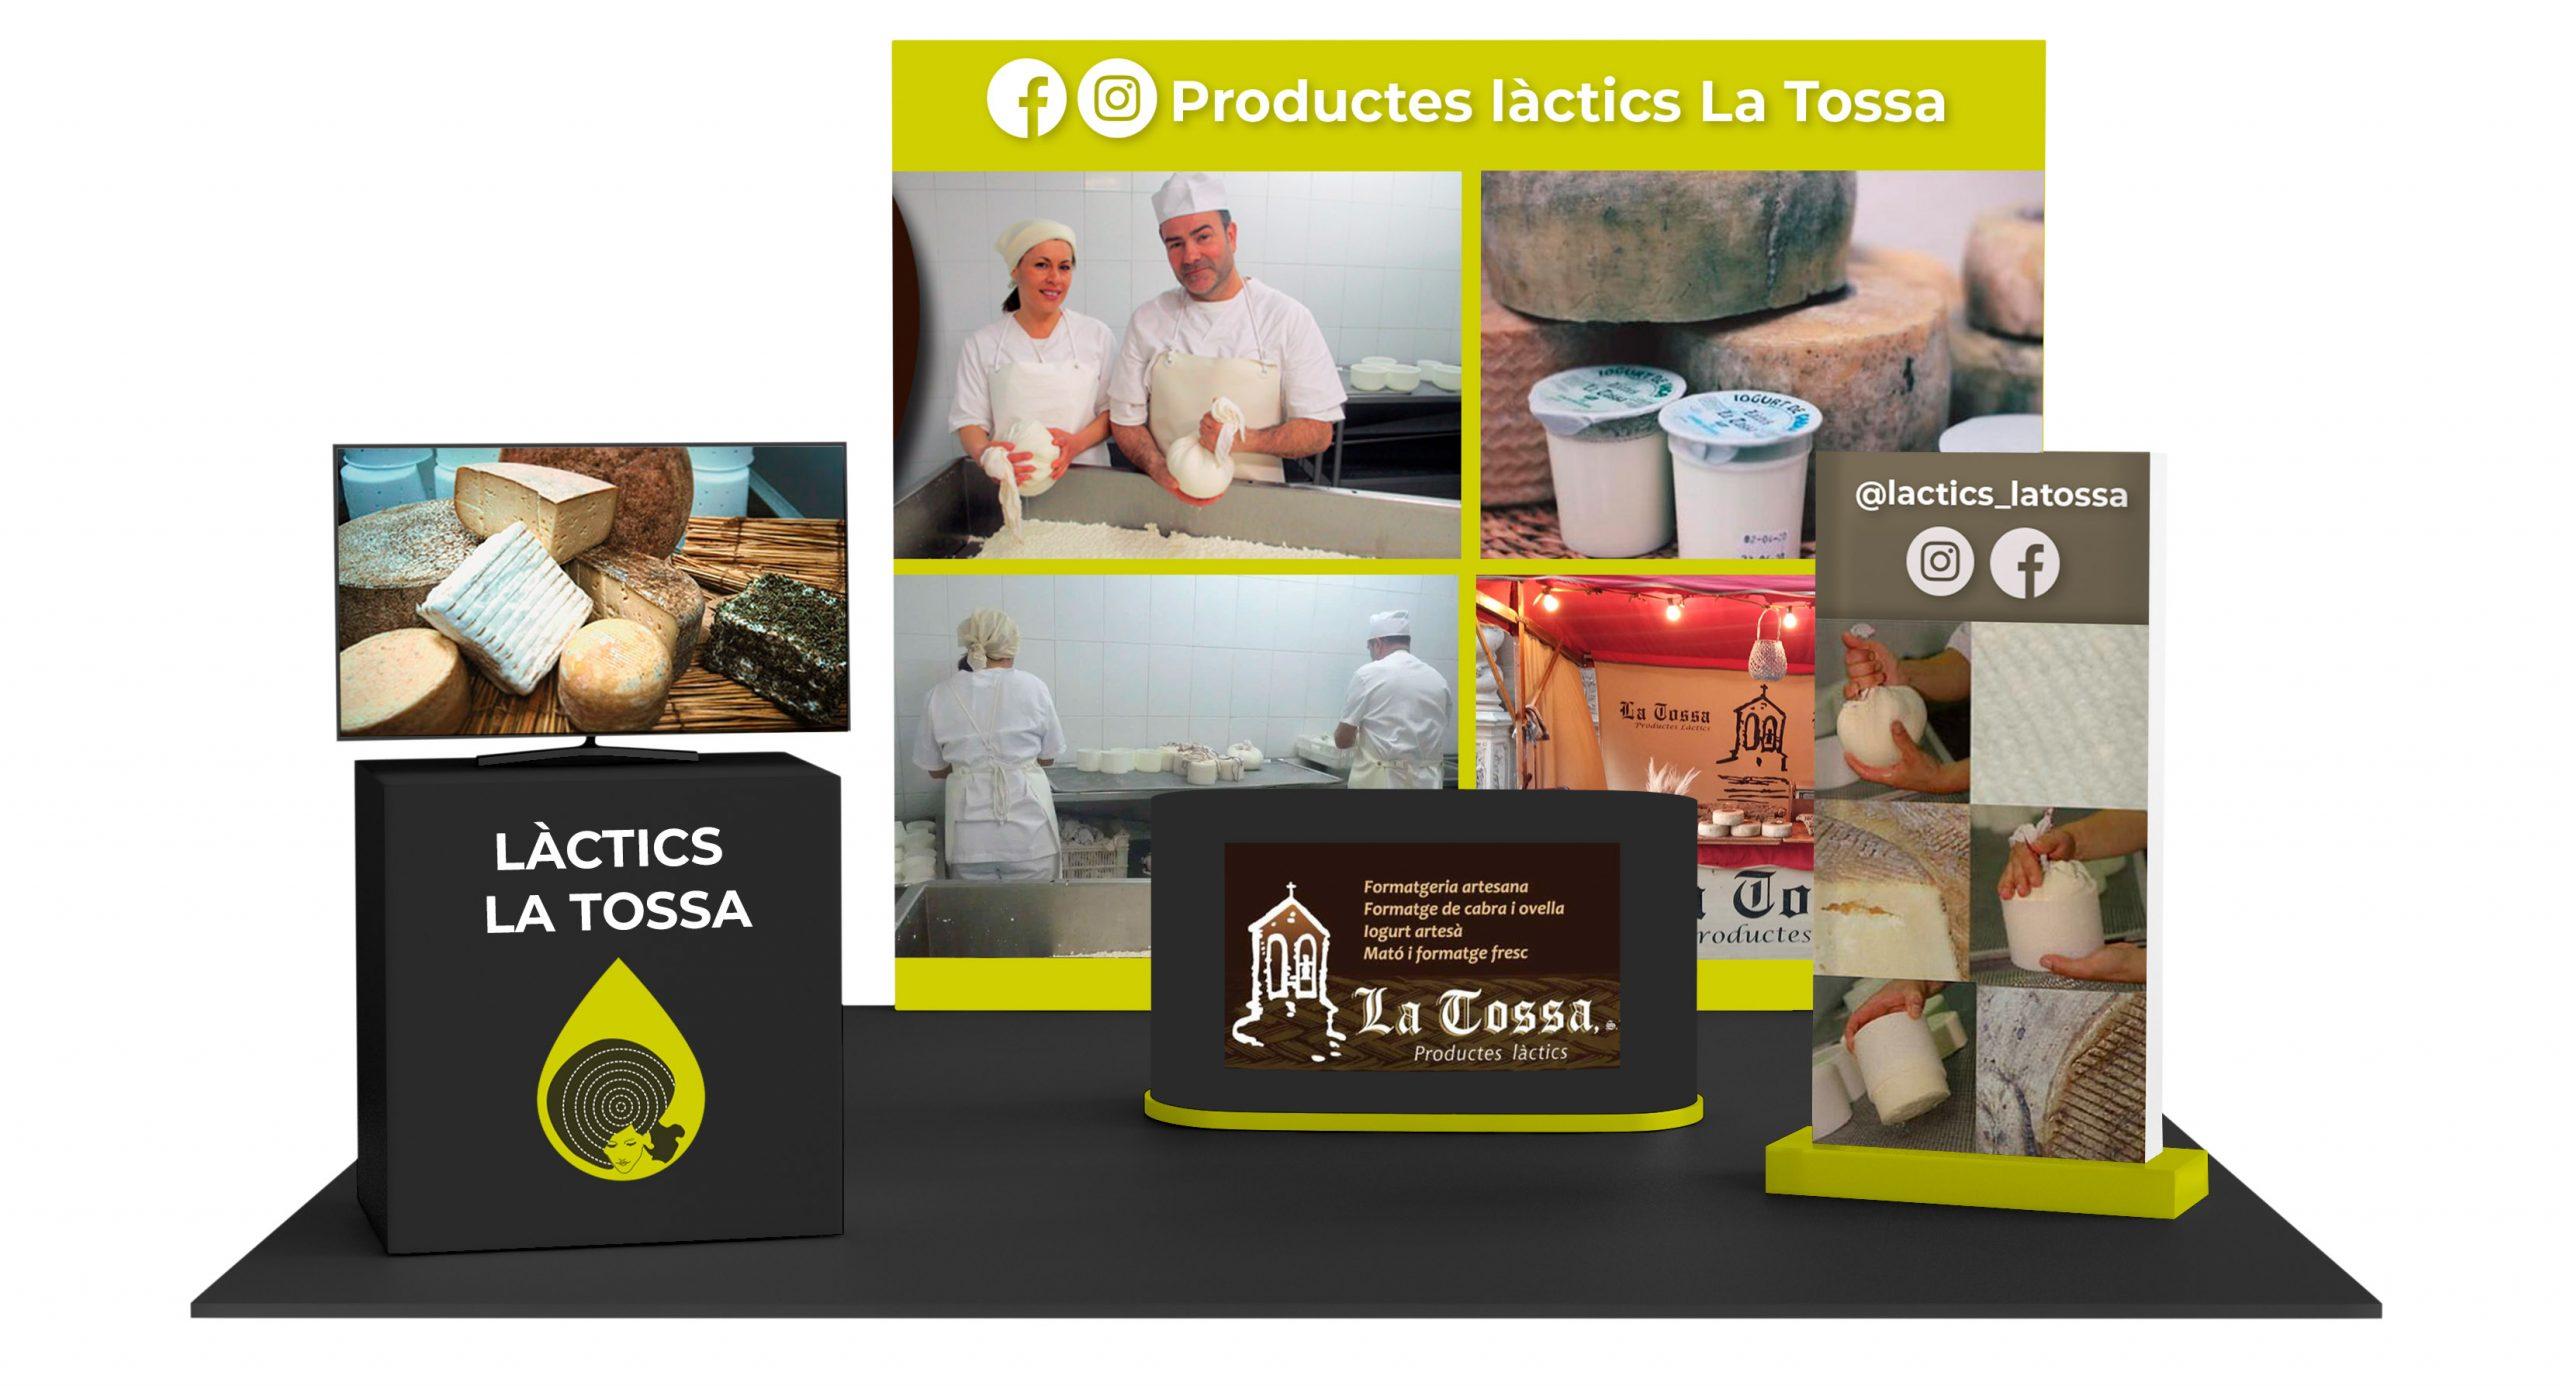 Làctics La Tossa